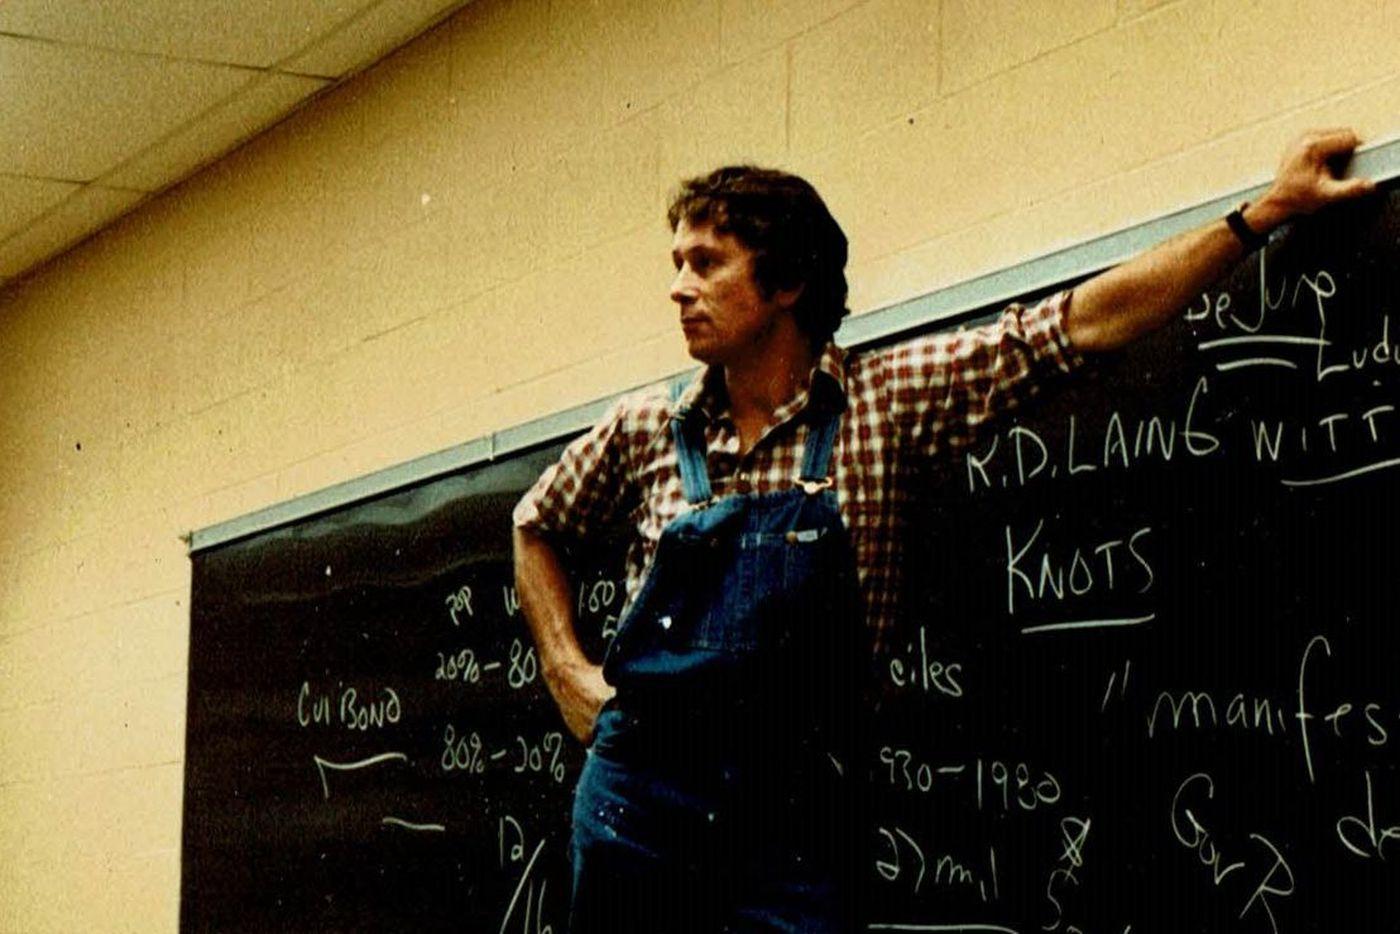 Frank A. Goodfellow III, 80, longtime Rowan professor